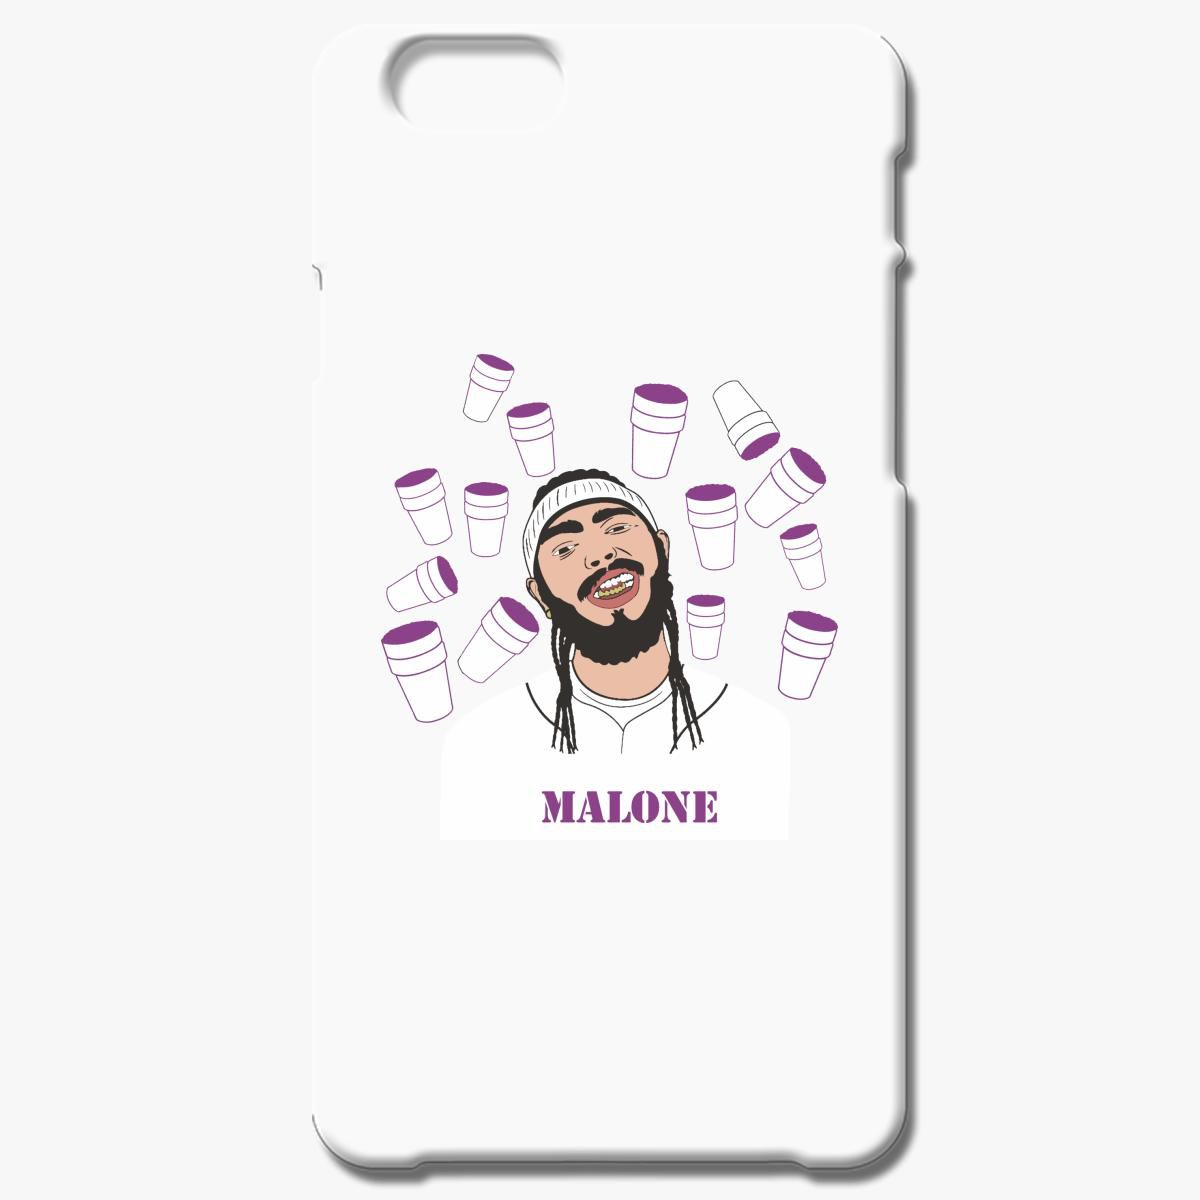 Post Malone Iphone 6 6s Plus Case